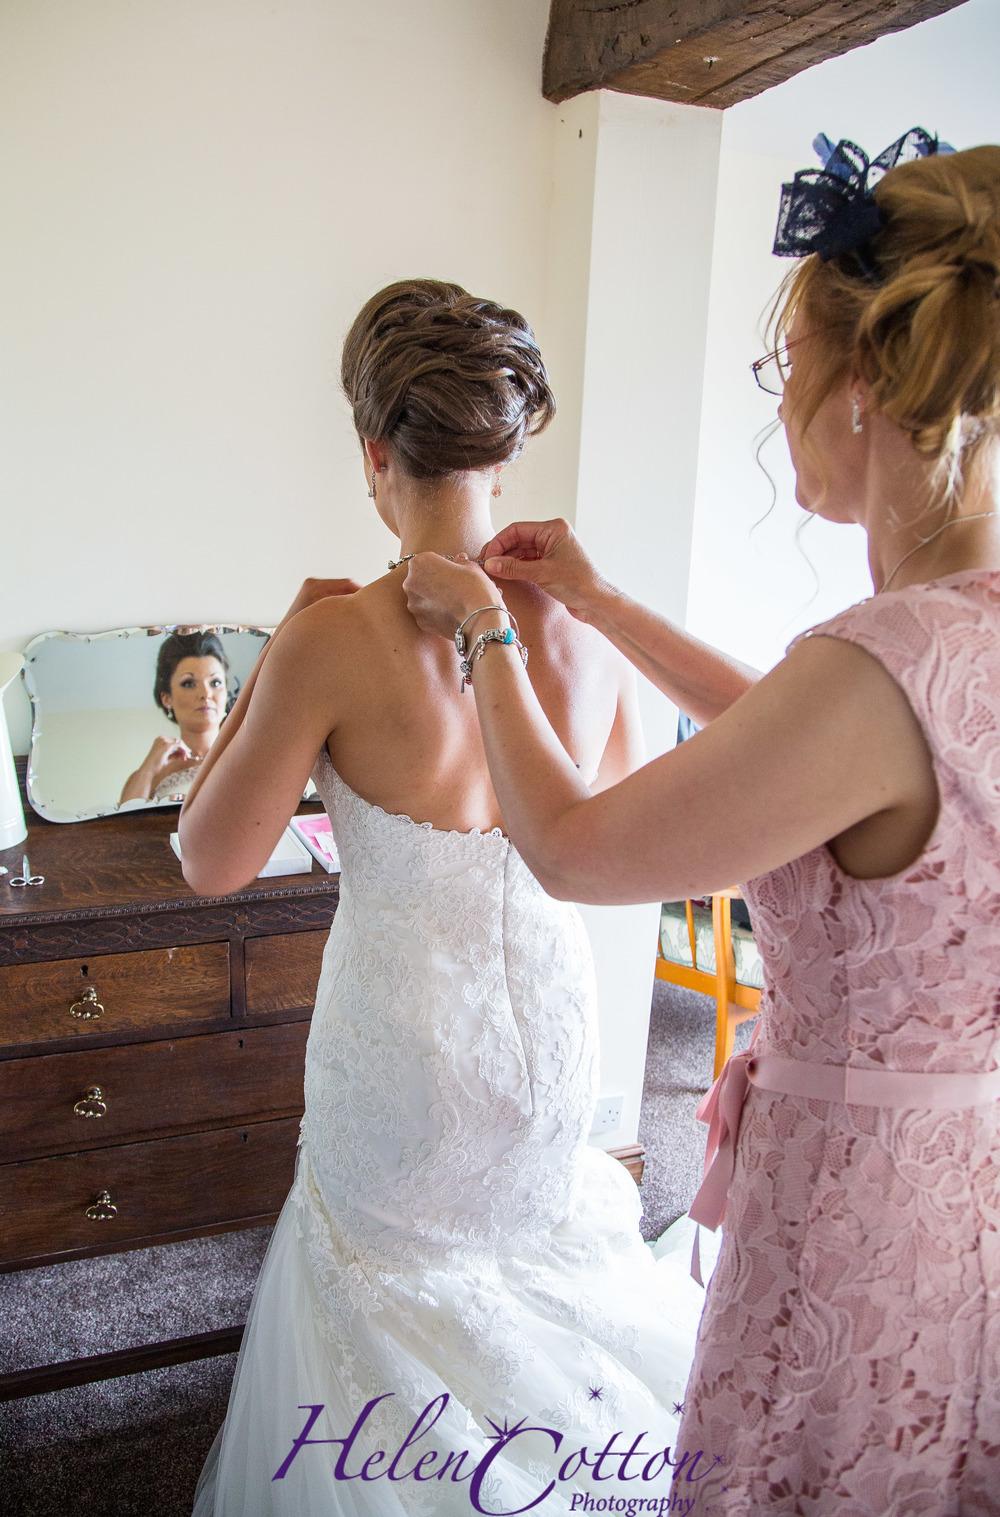 Sian & Rob's Wedding_Helen Cotton Photography©-0572.JPG